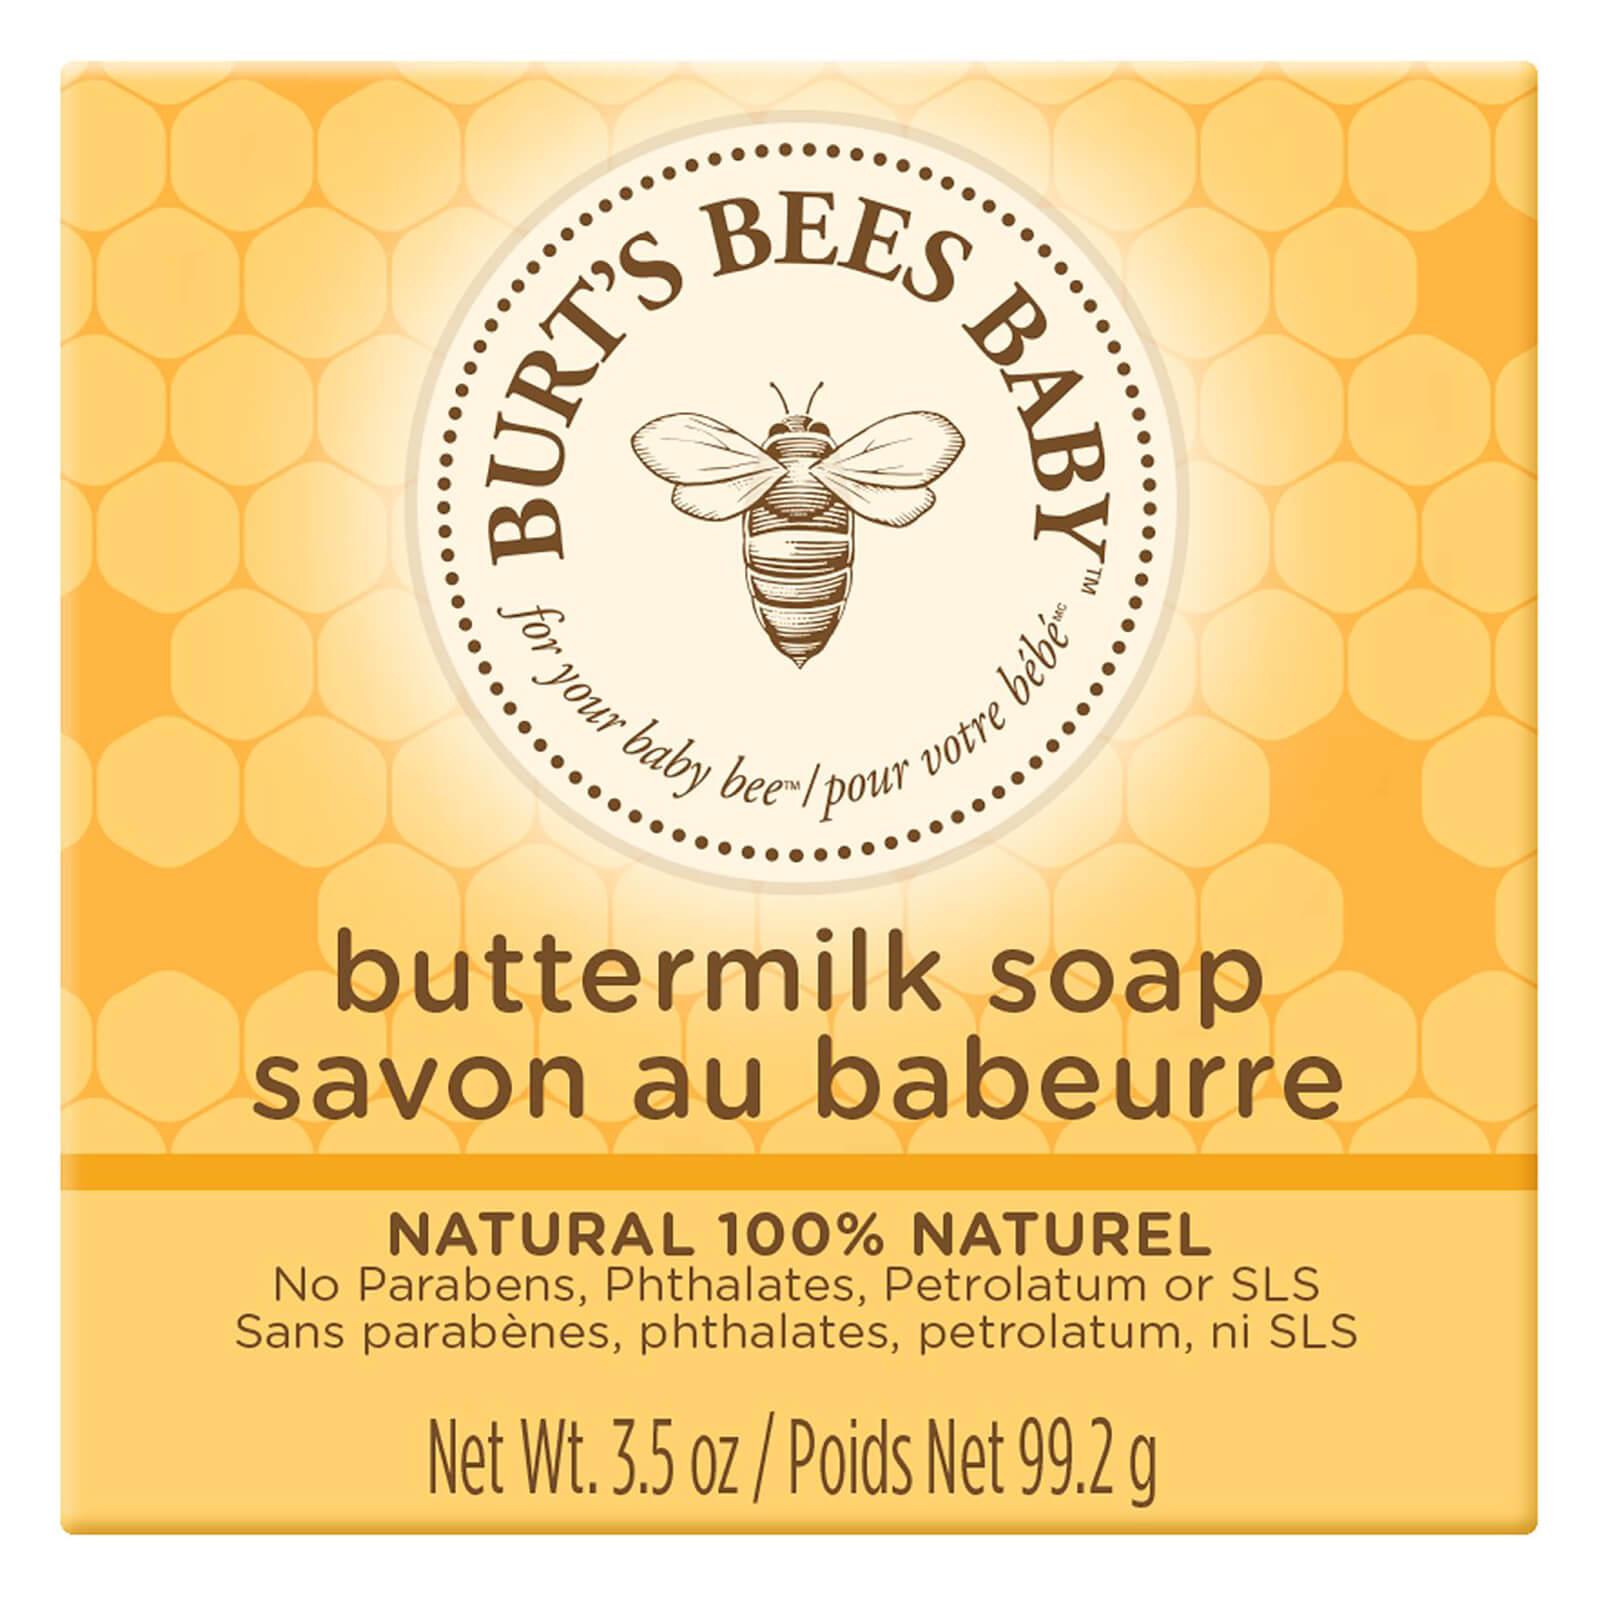 Burts Bees Baby Bee Buttermilk Soap (99g)